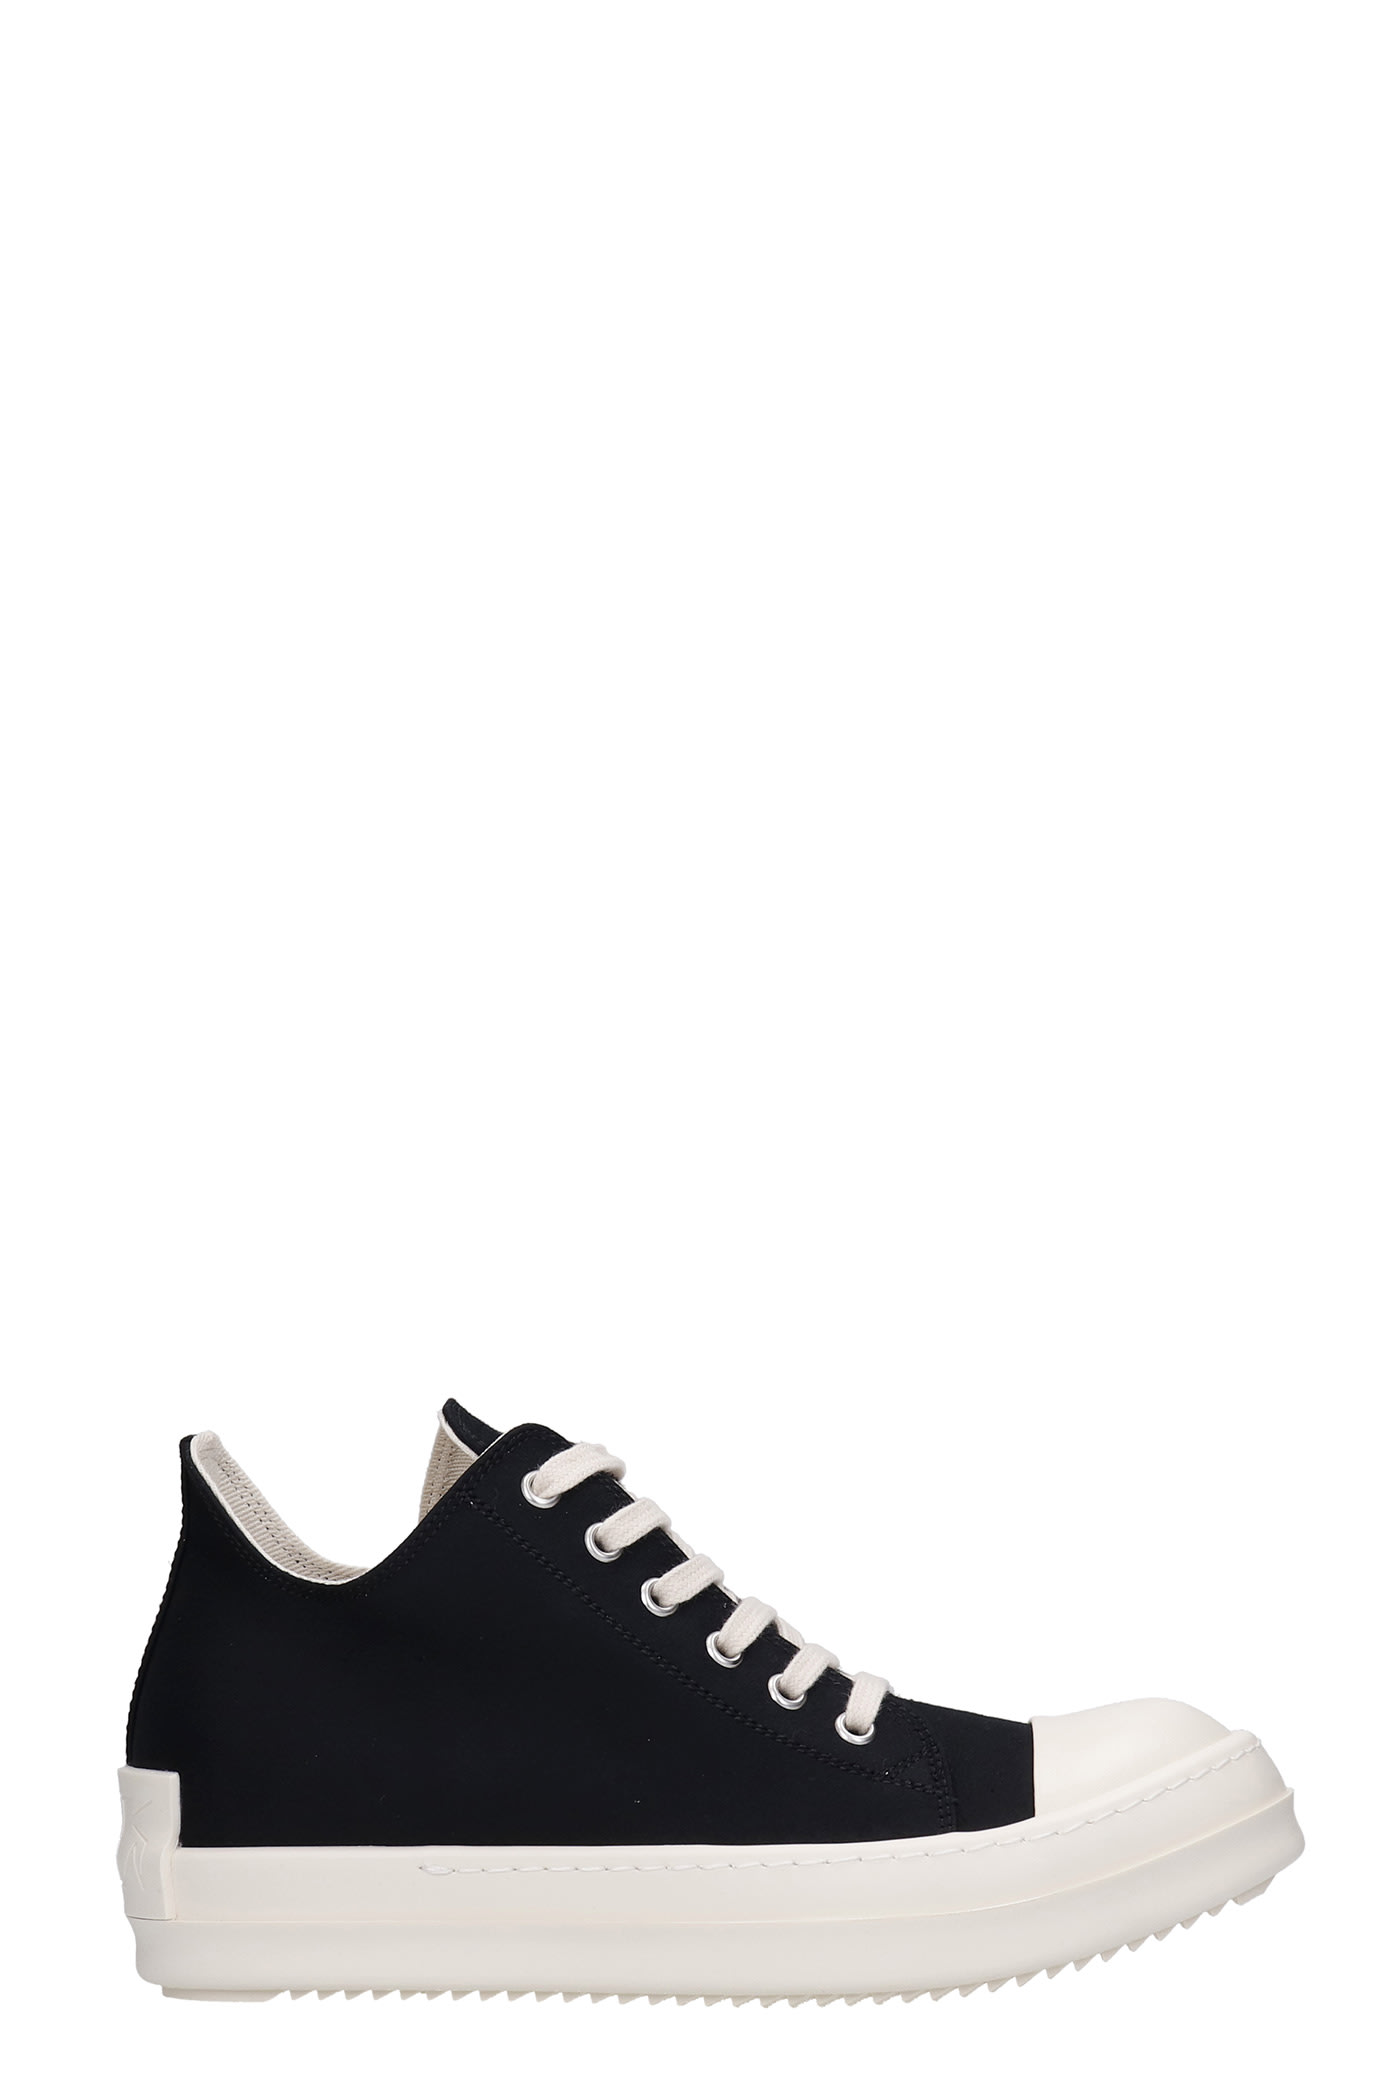 Sneakers In Black Canvas